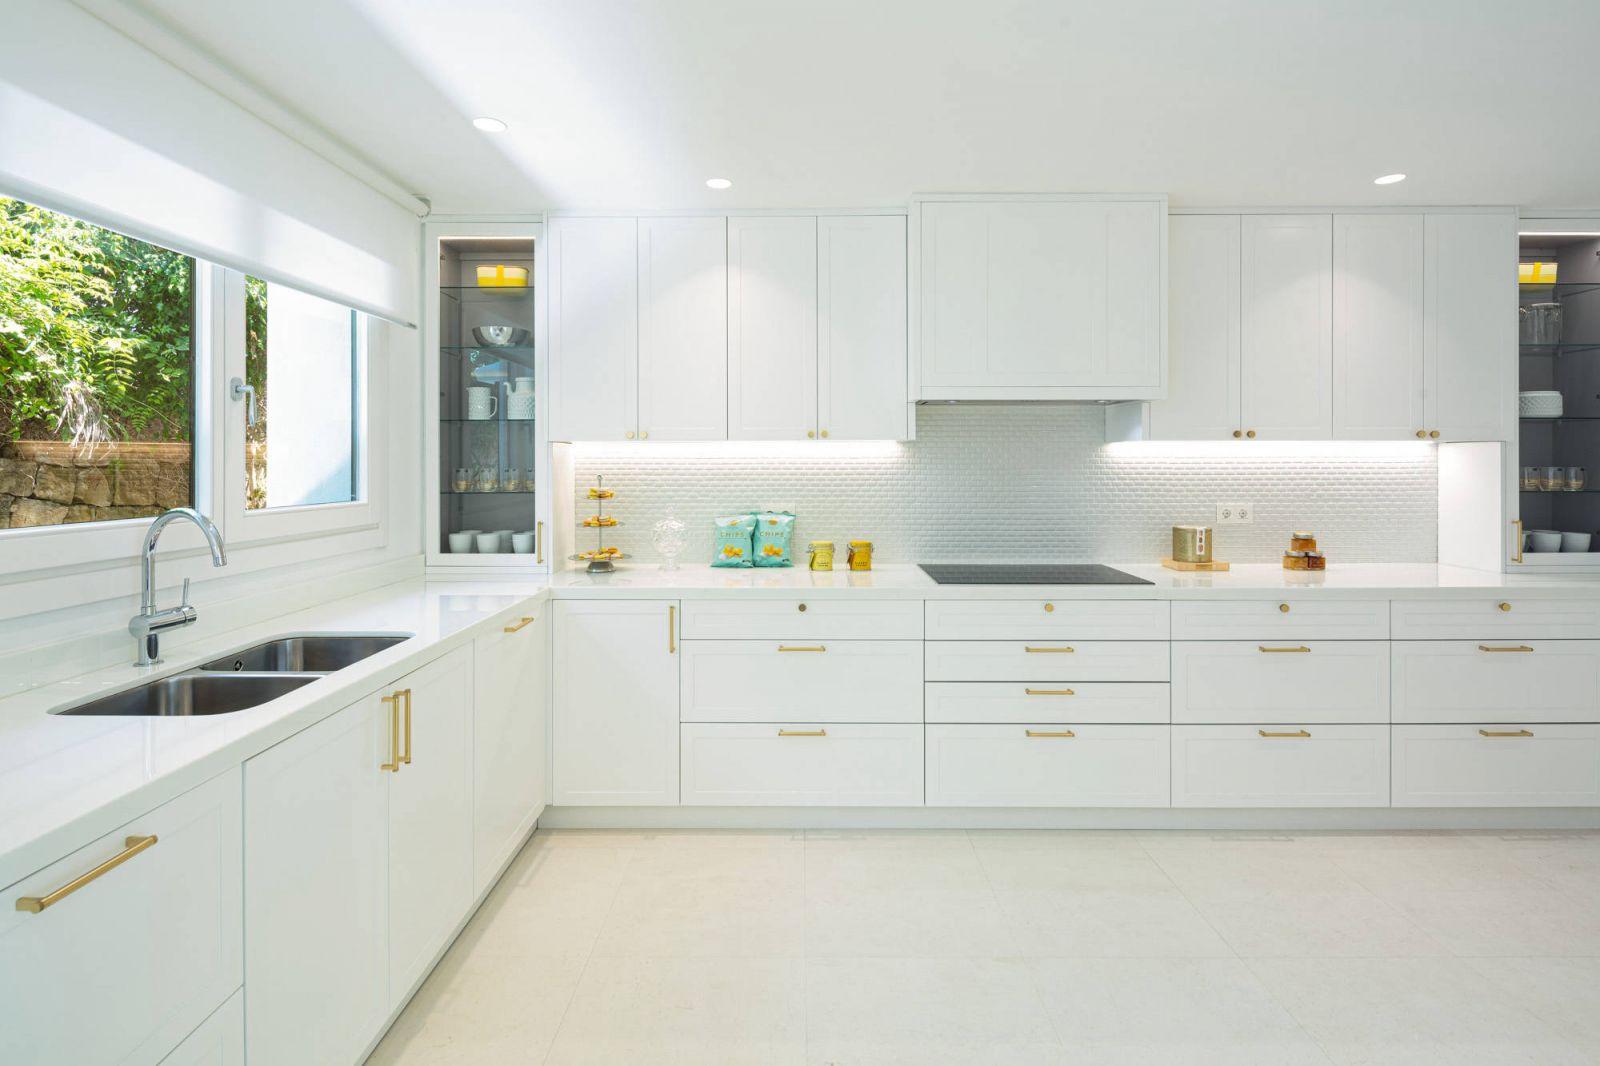 Luxury Villa Cordoba Nueva Andalucia